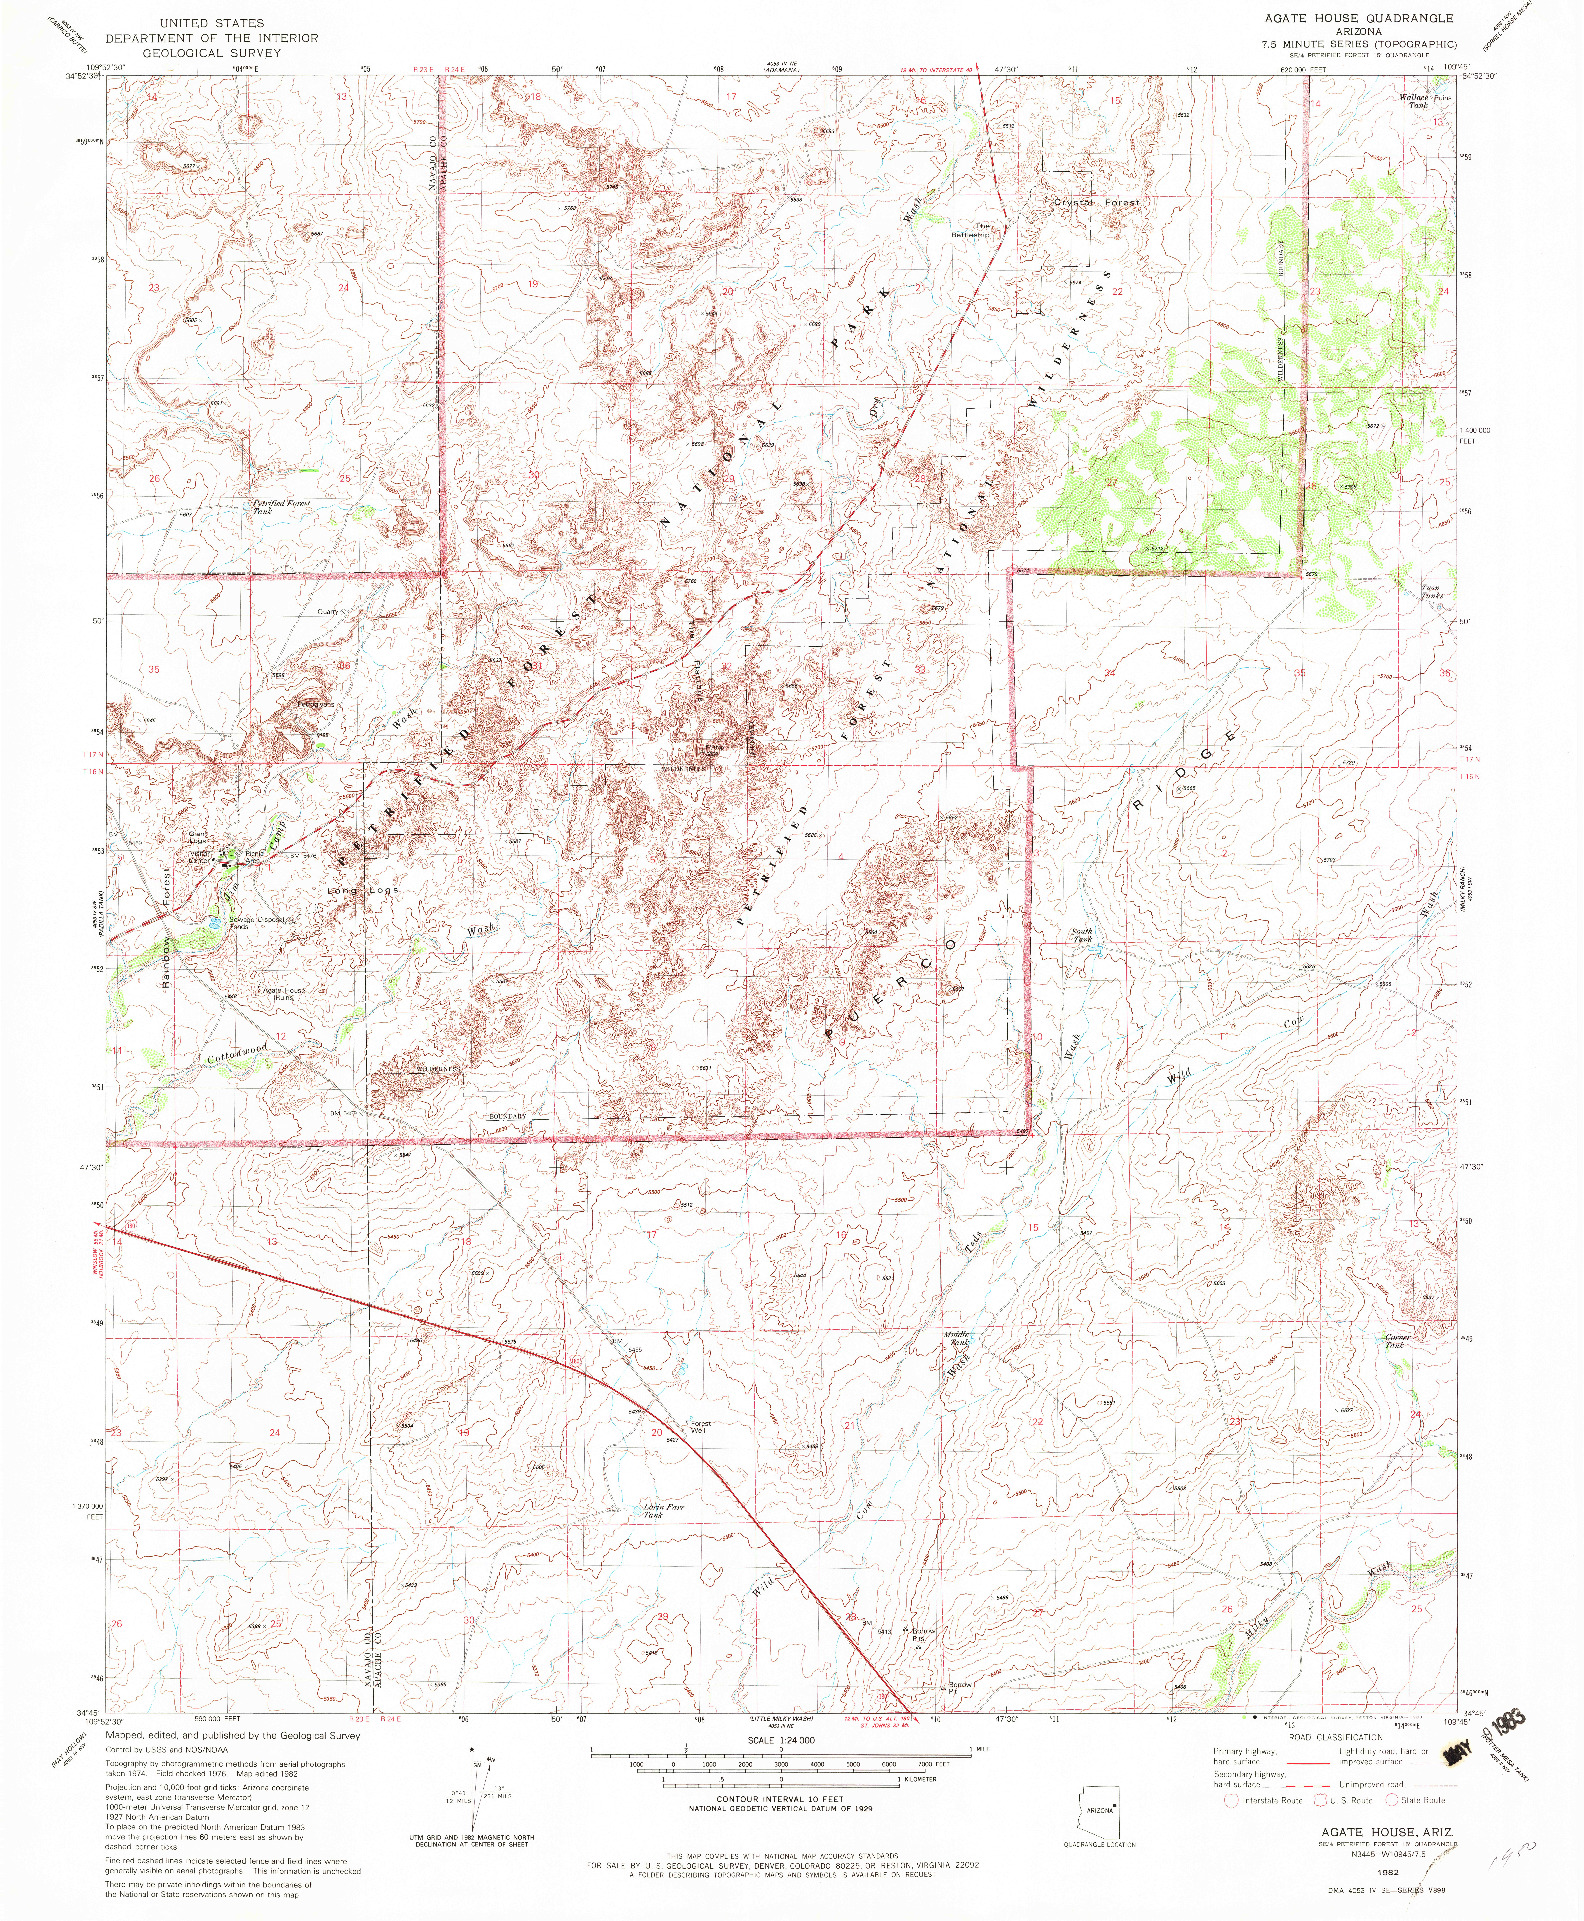 USGS 1:24000-SCALE QUADRANGLE FOR AGATE HOUSE, AZ 1982